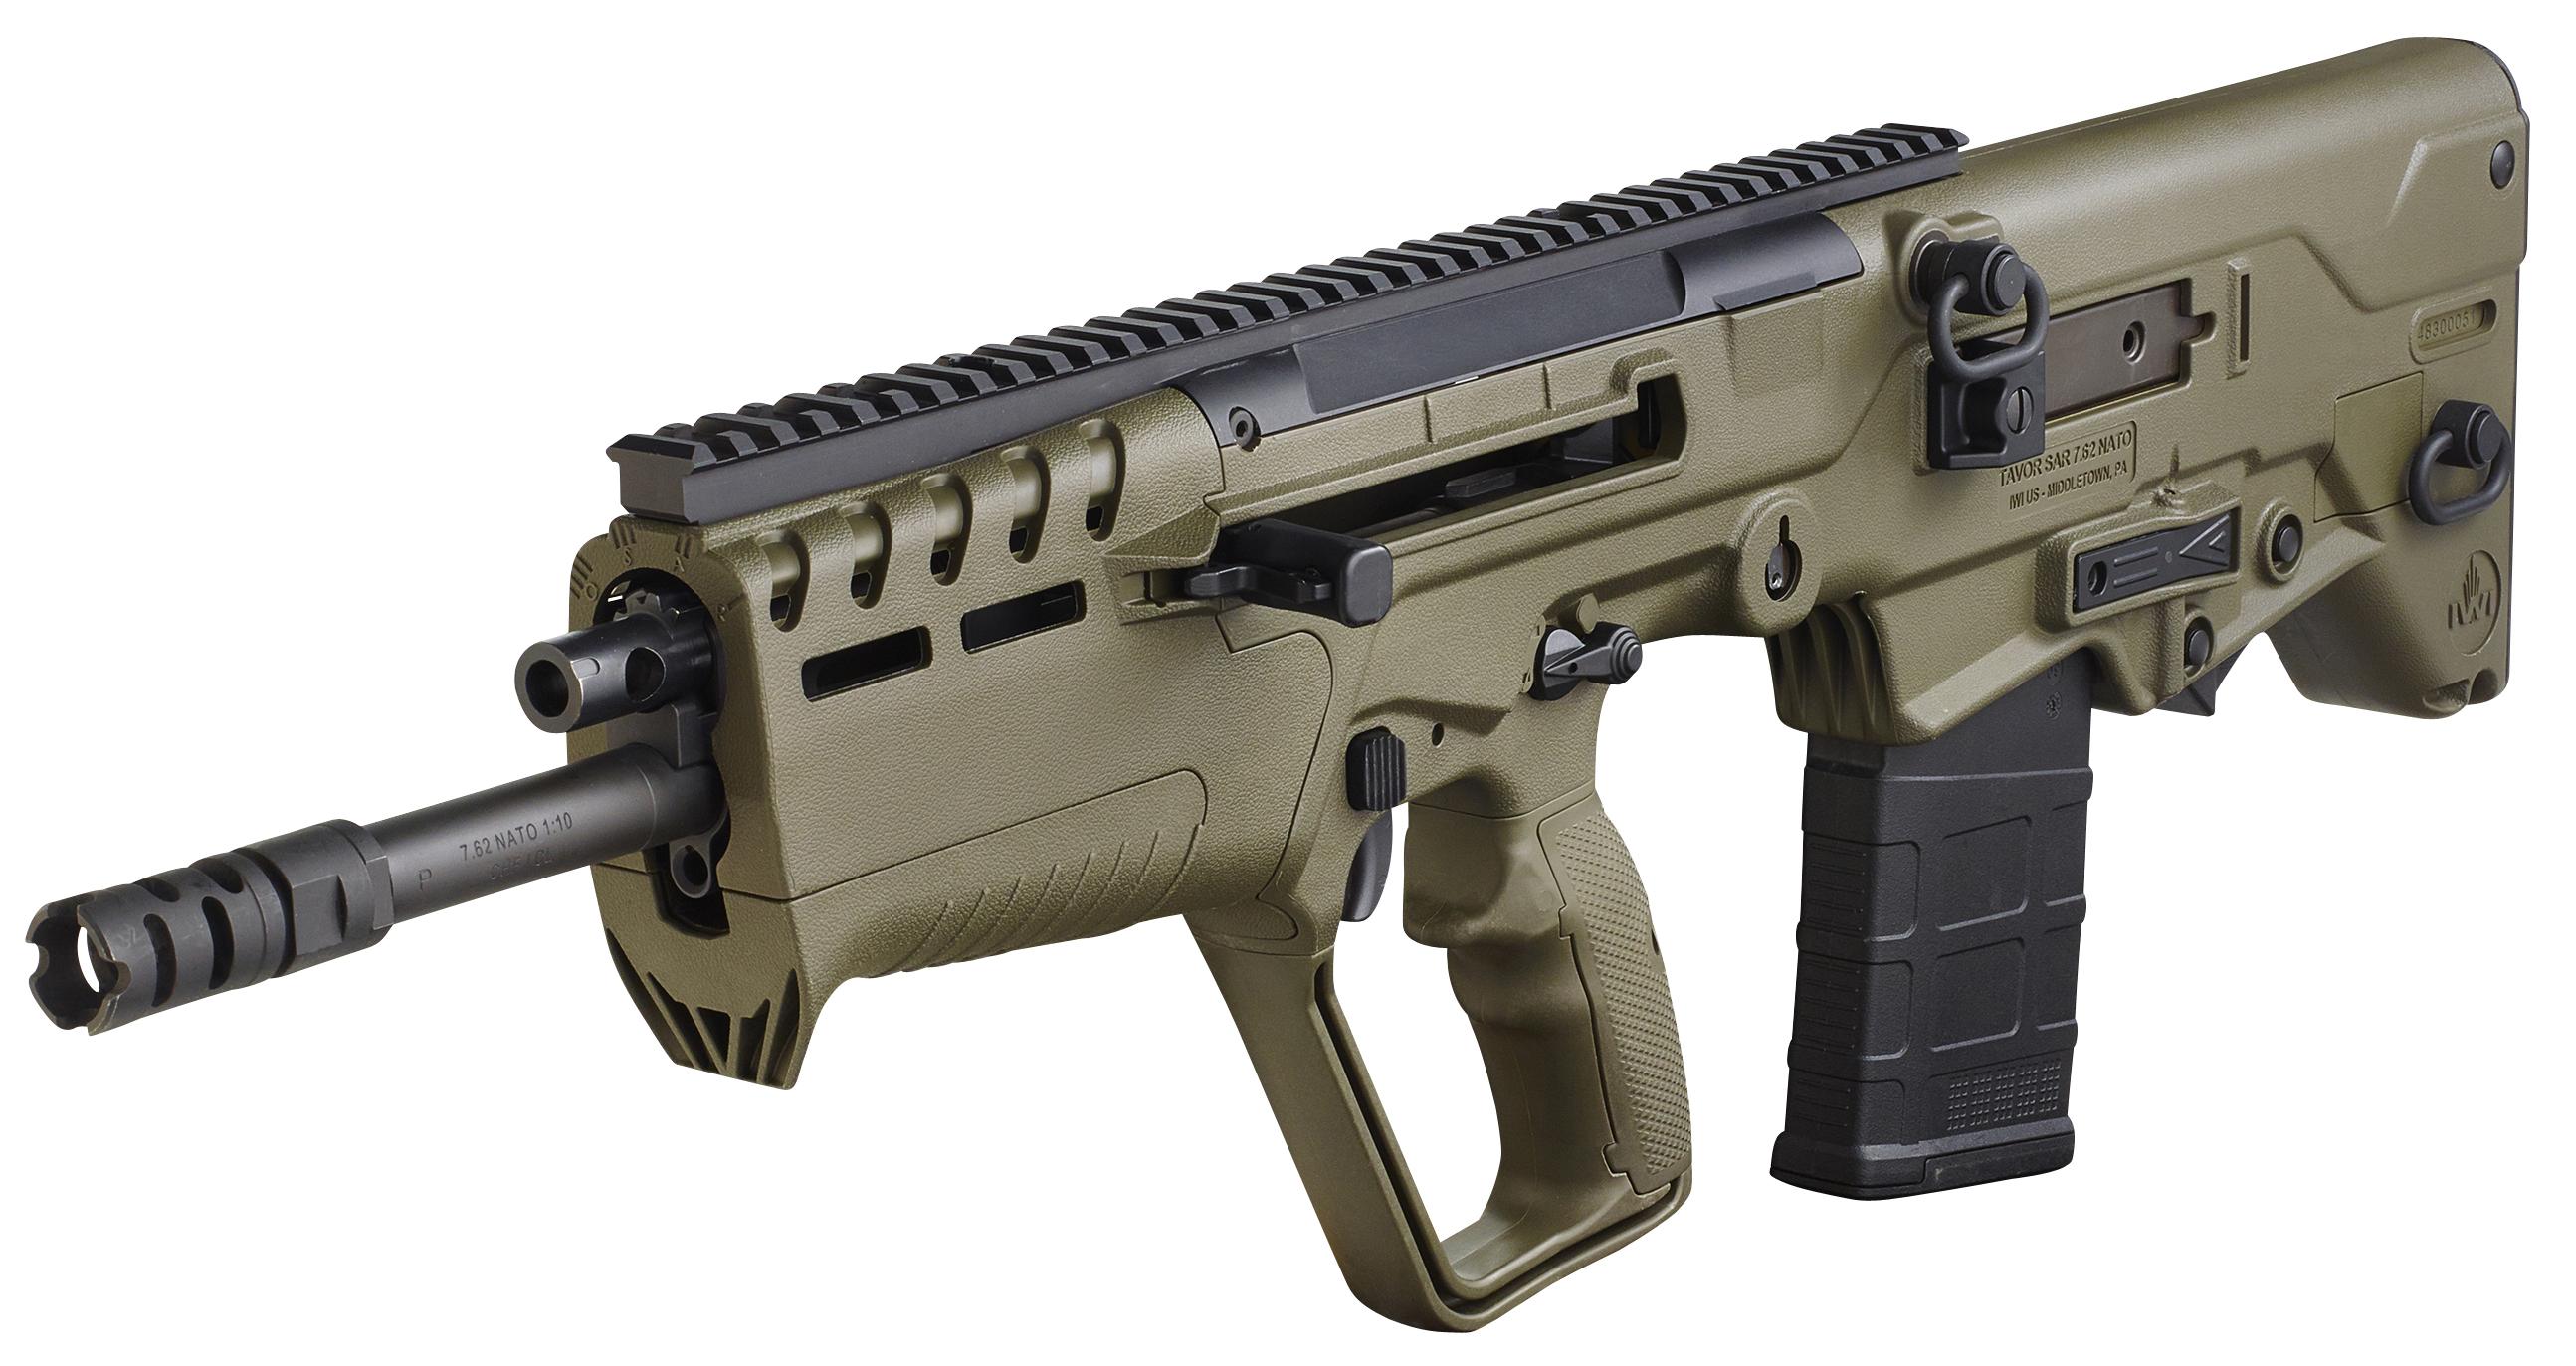 IWI US T7G2010 Tavor 7 7.62x51mm NATO 20